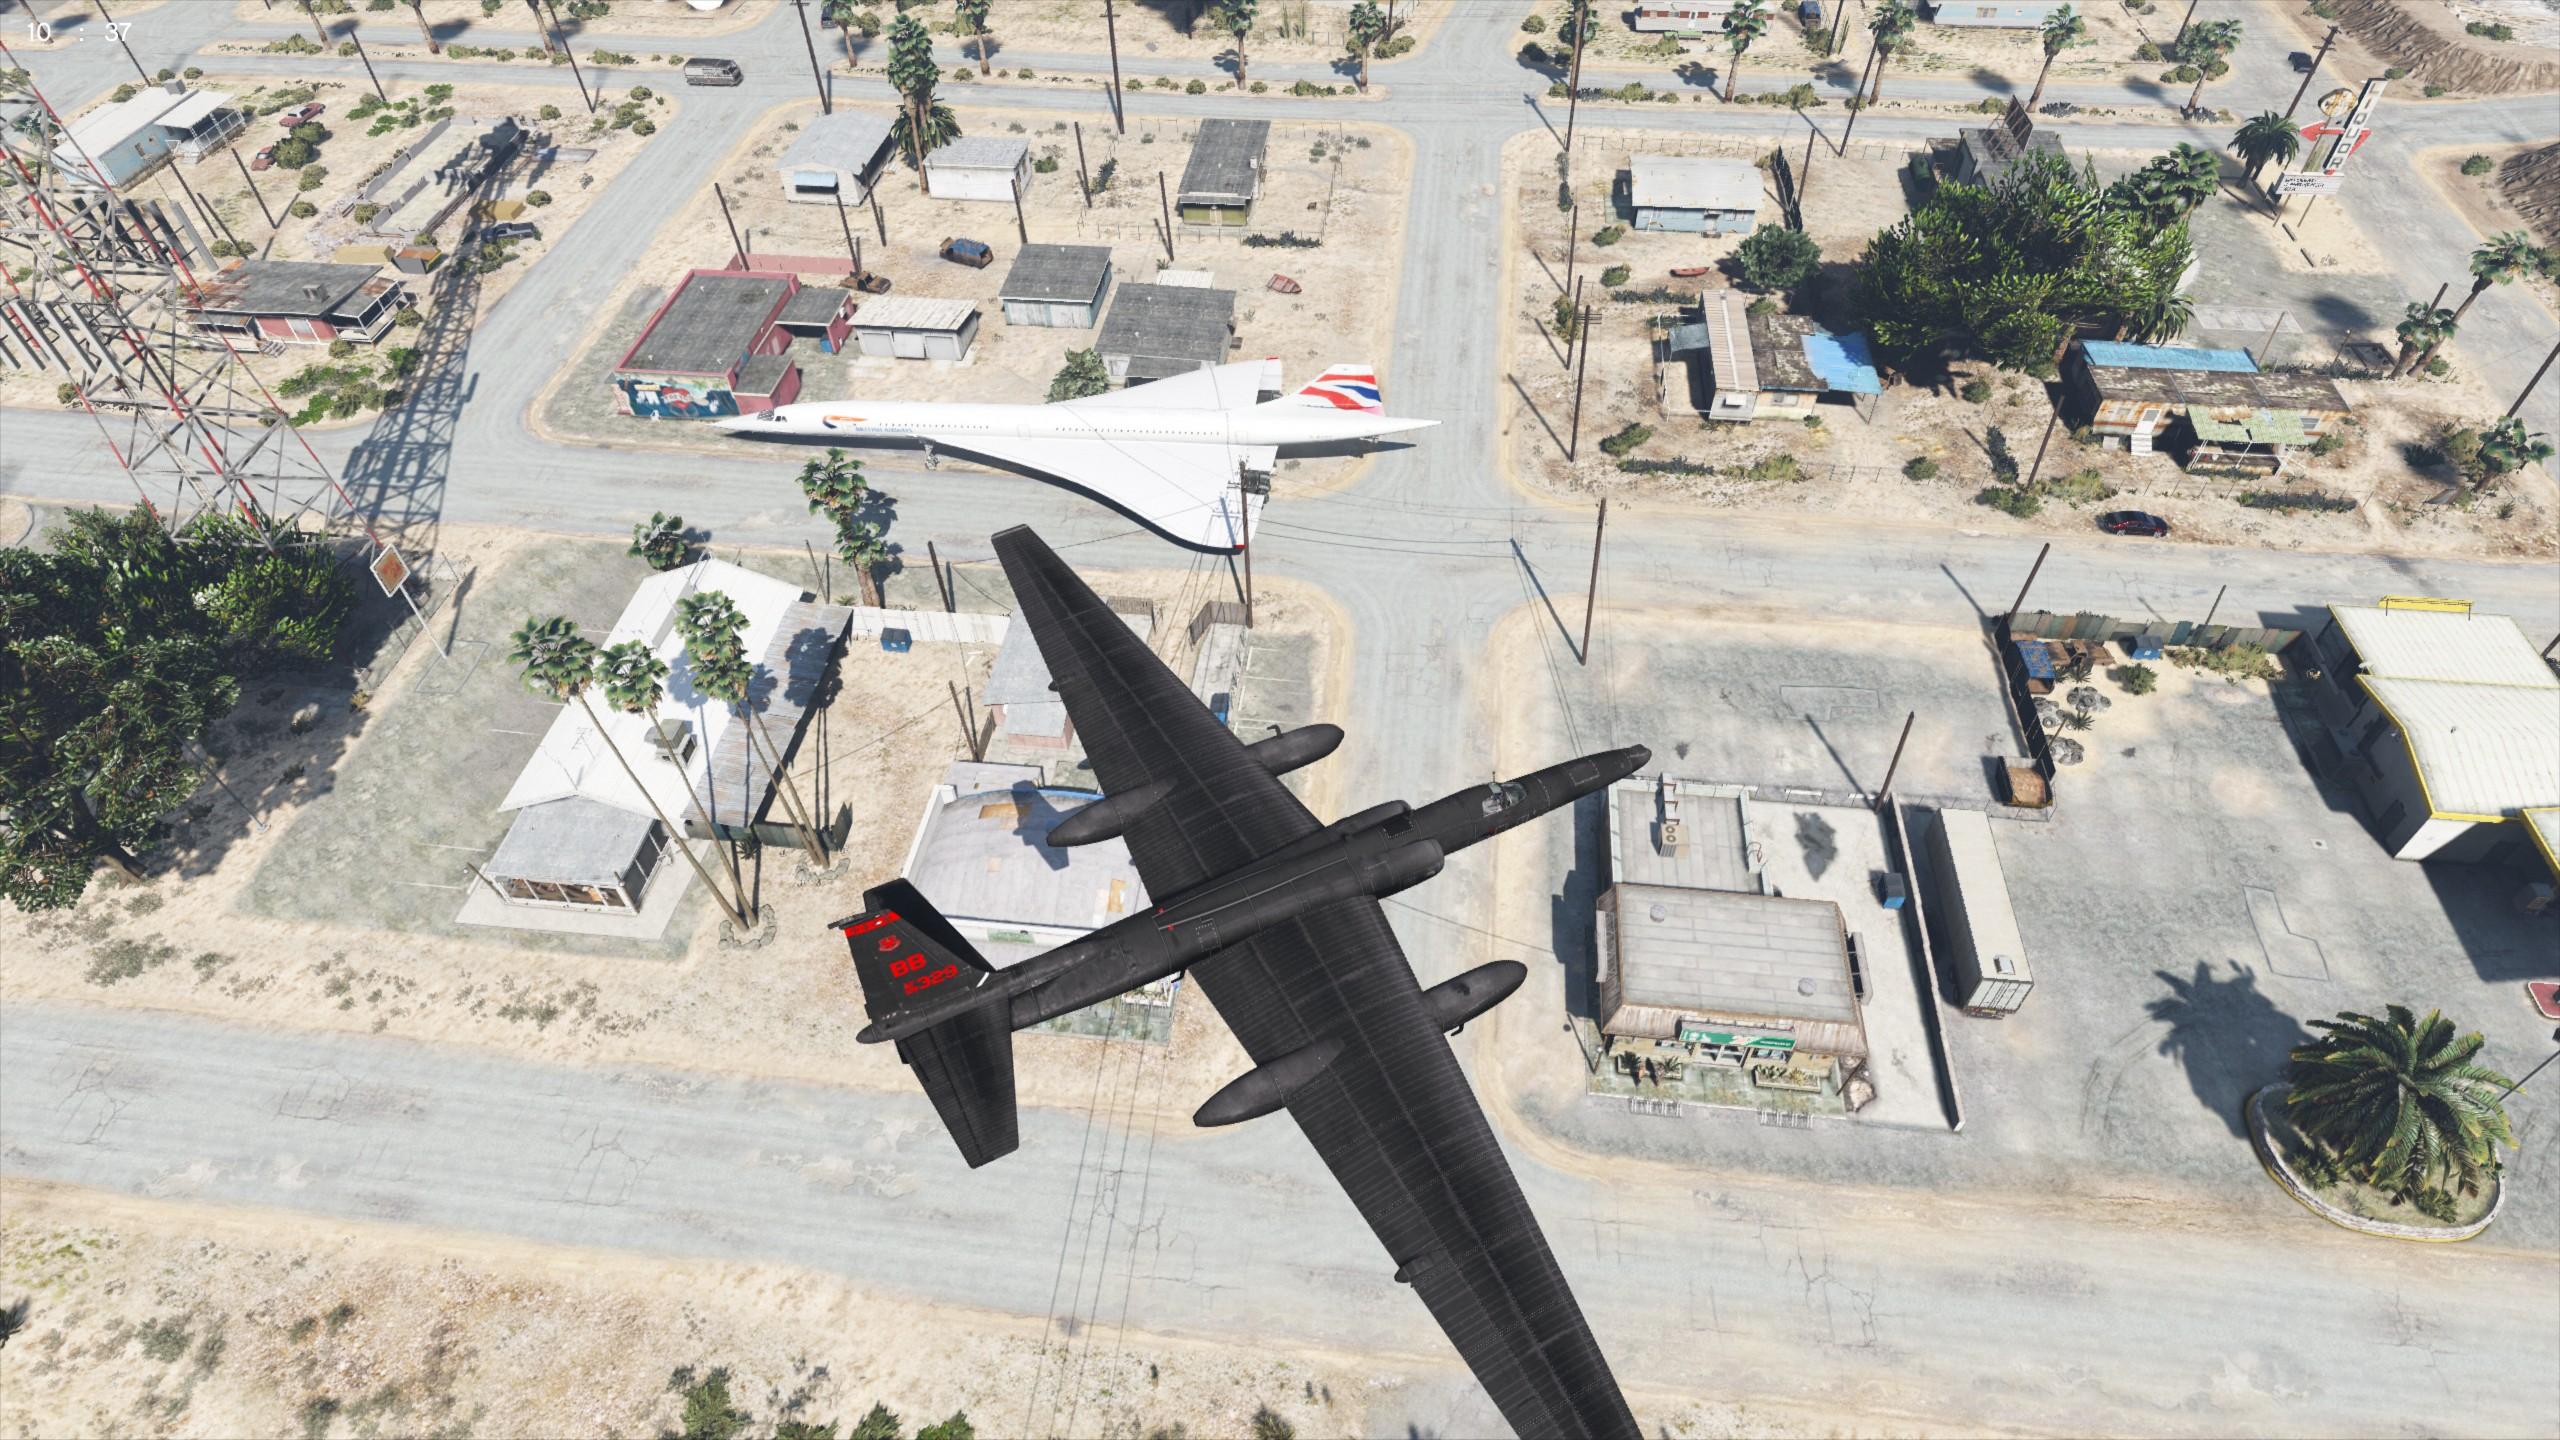 Fond D Ecran 2560x1440 Px Concorde Grand Theft Auto V